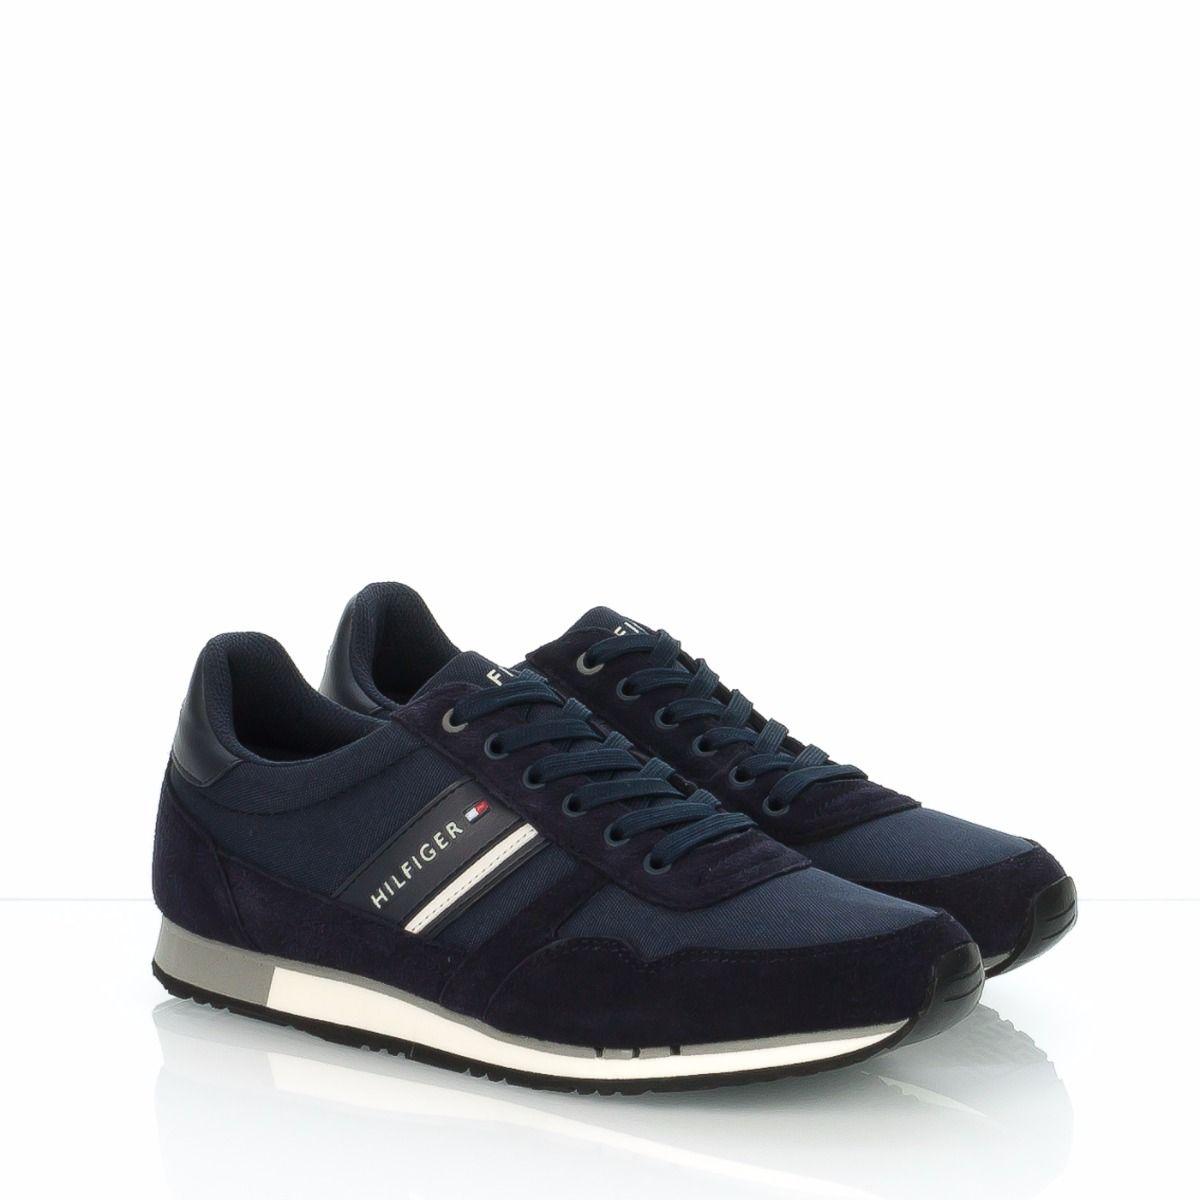 Scarpa sneakers da uomo TOMMY HILFIGER blu, zona Treviso